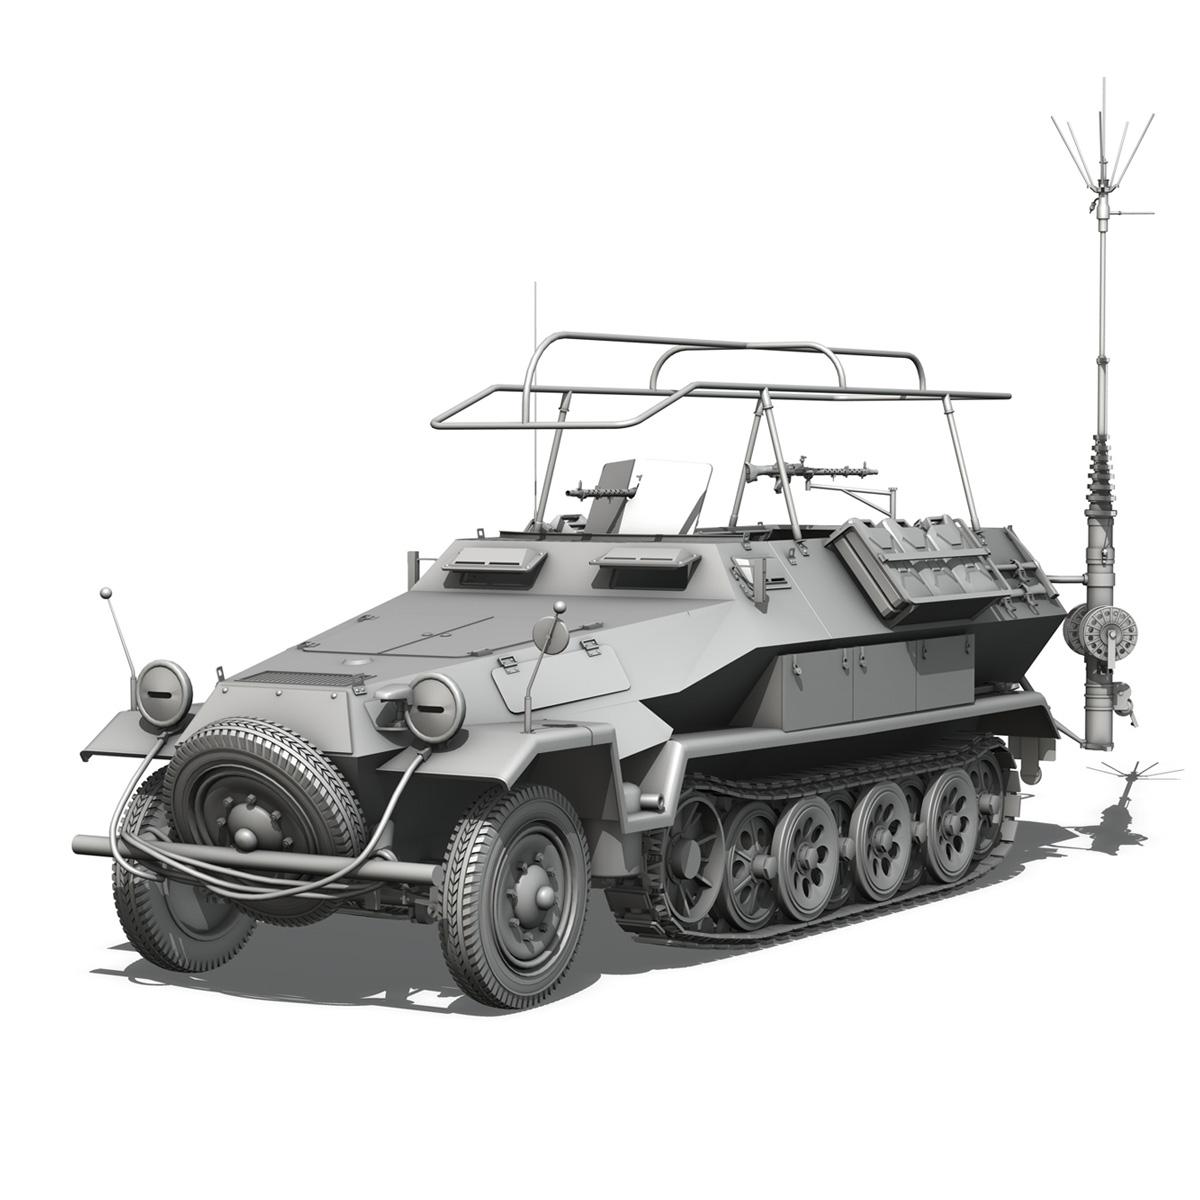 sdkfz 251 ausf.b – communications vehicle 3d model 3ds fbx c4d lwo obj 251692